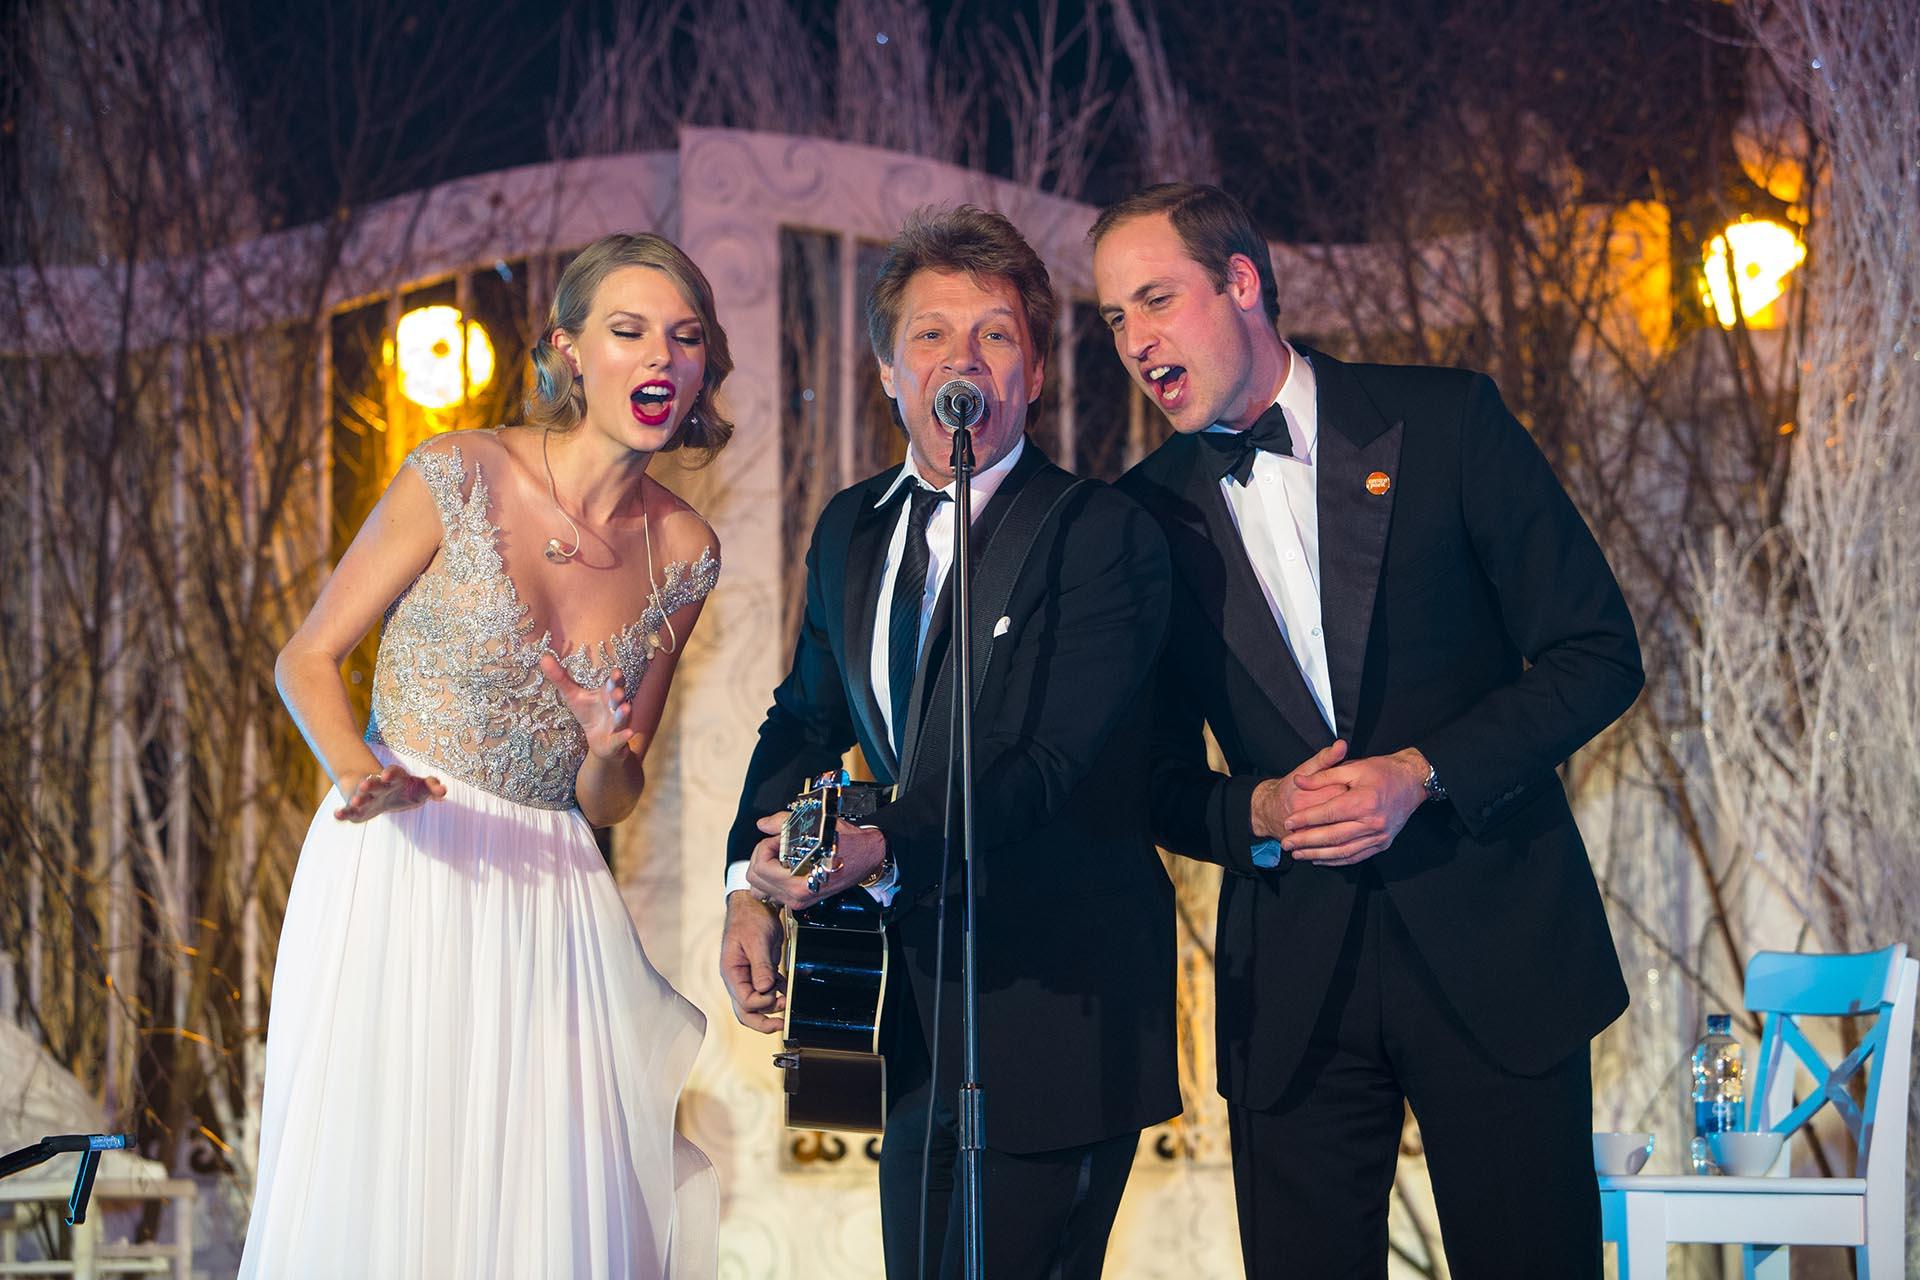 Liz Taylor Of TLC LTD - Prince William,Taylor Swift, Jon Bon